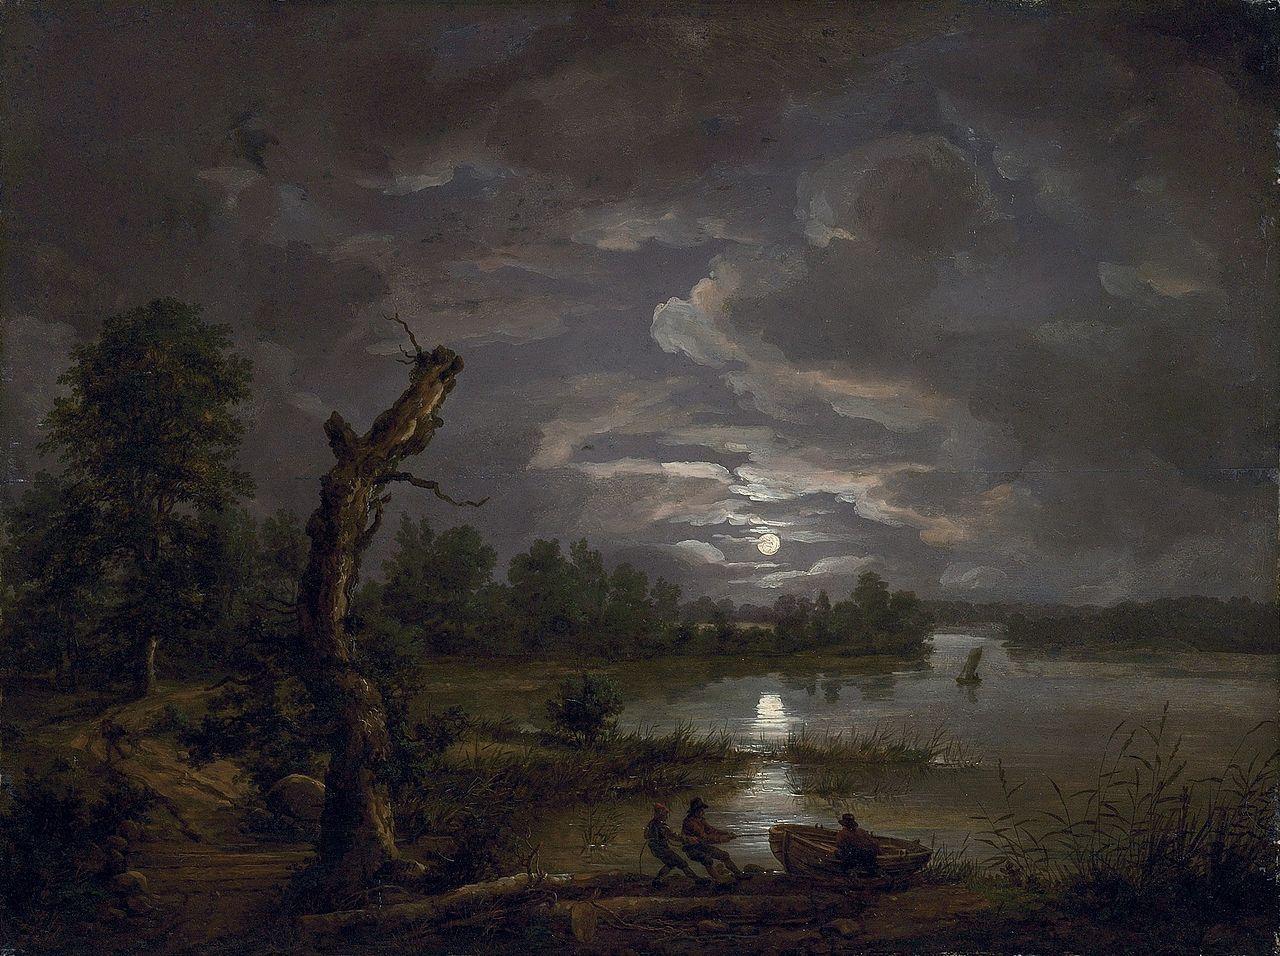 Lake Esrom By Moonlight JCC Dahl  Johan Christian Dahl - Christian museums in the usa